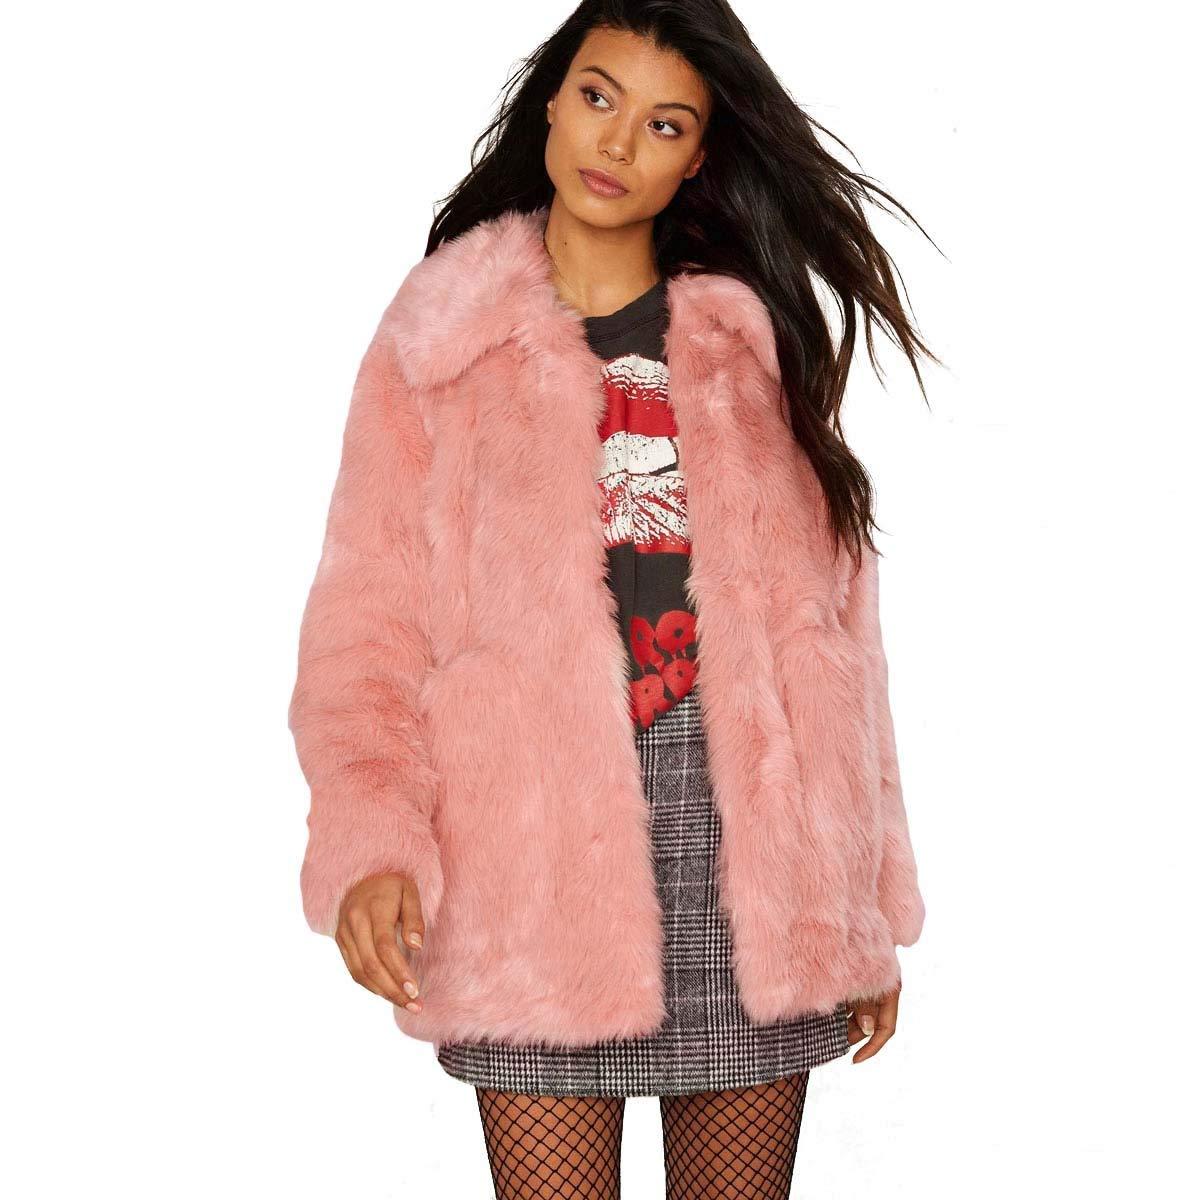 95b7f140db7 Get Quotations · WeHeart Women Fur Coat Classic Thick Warm Faux Fur Coat  Pink Pockets Fur Jacket